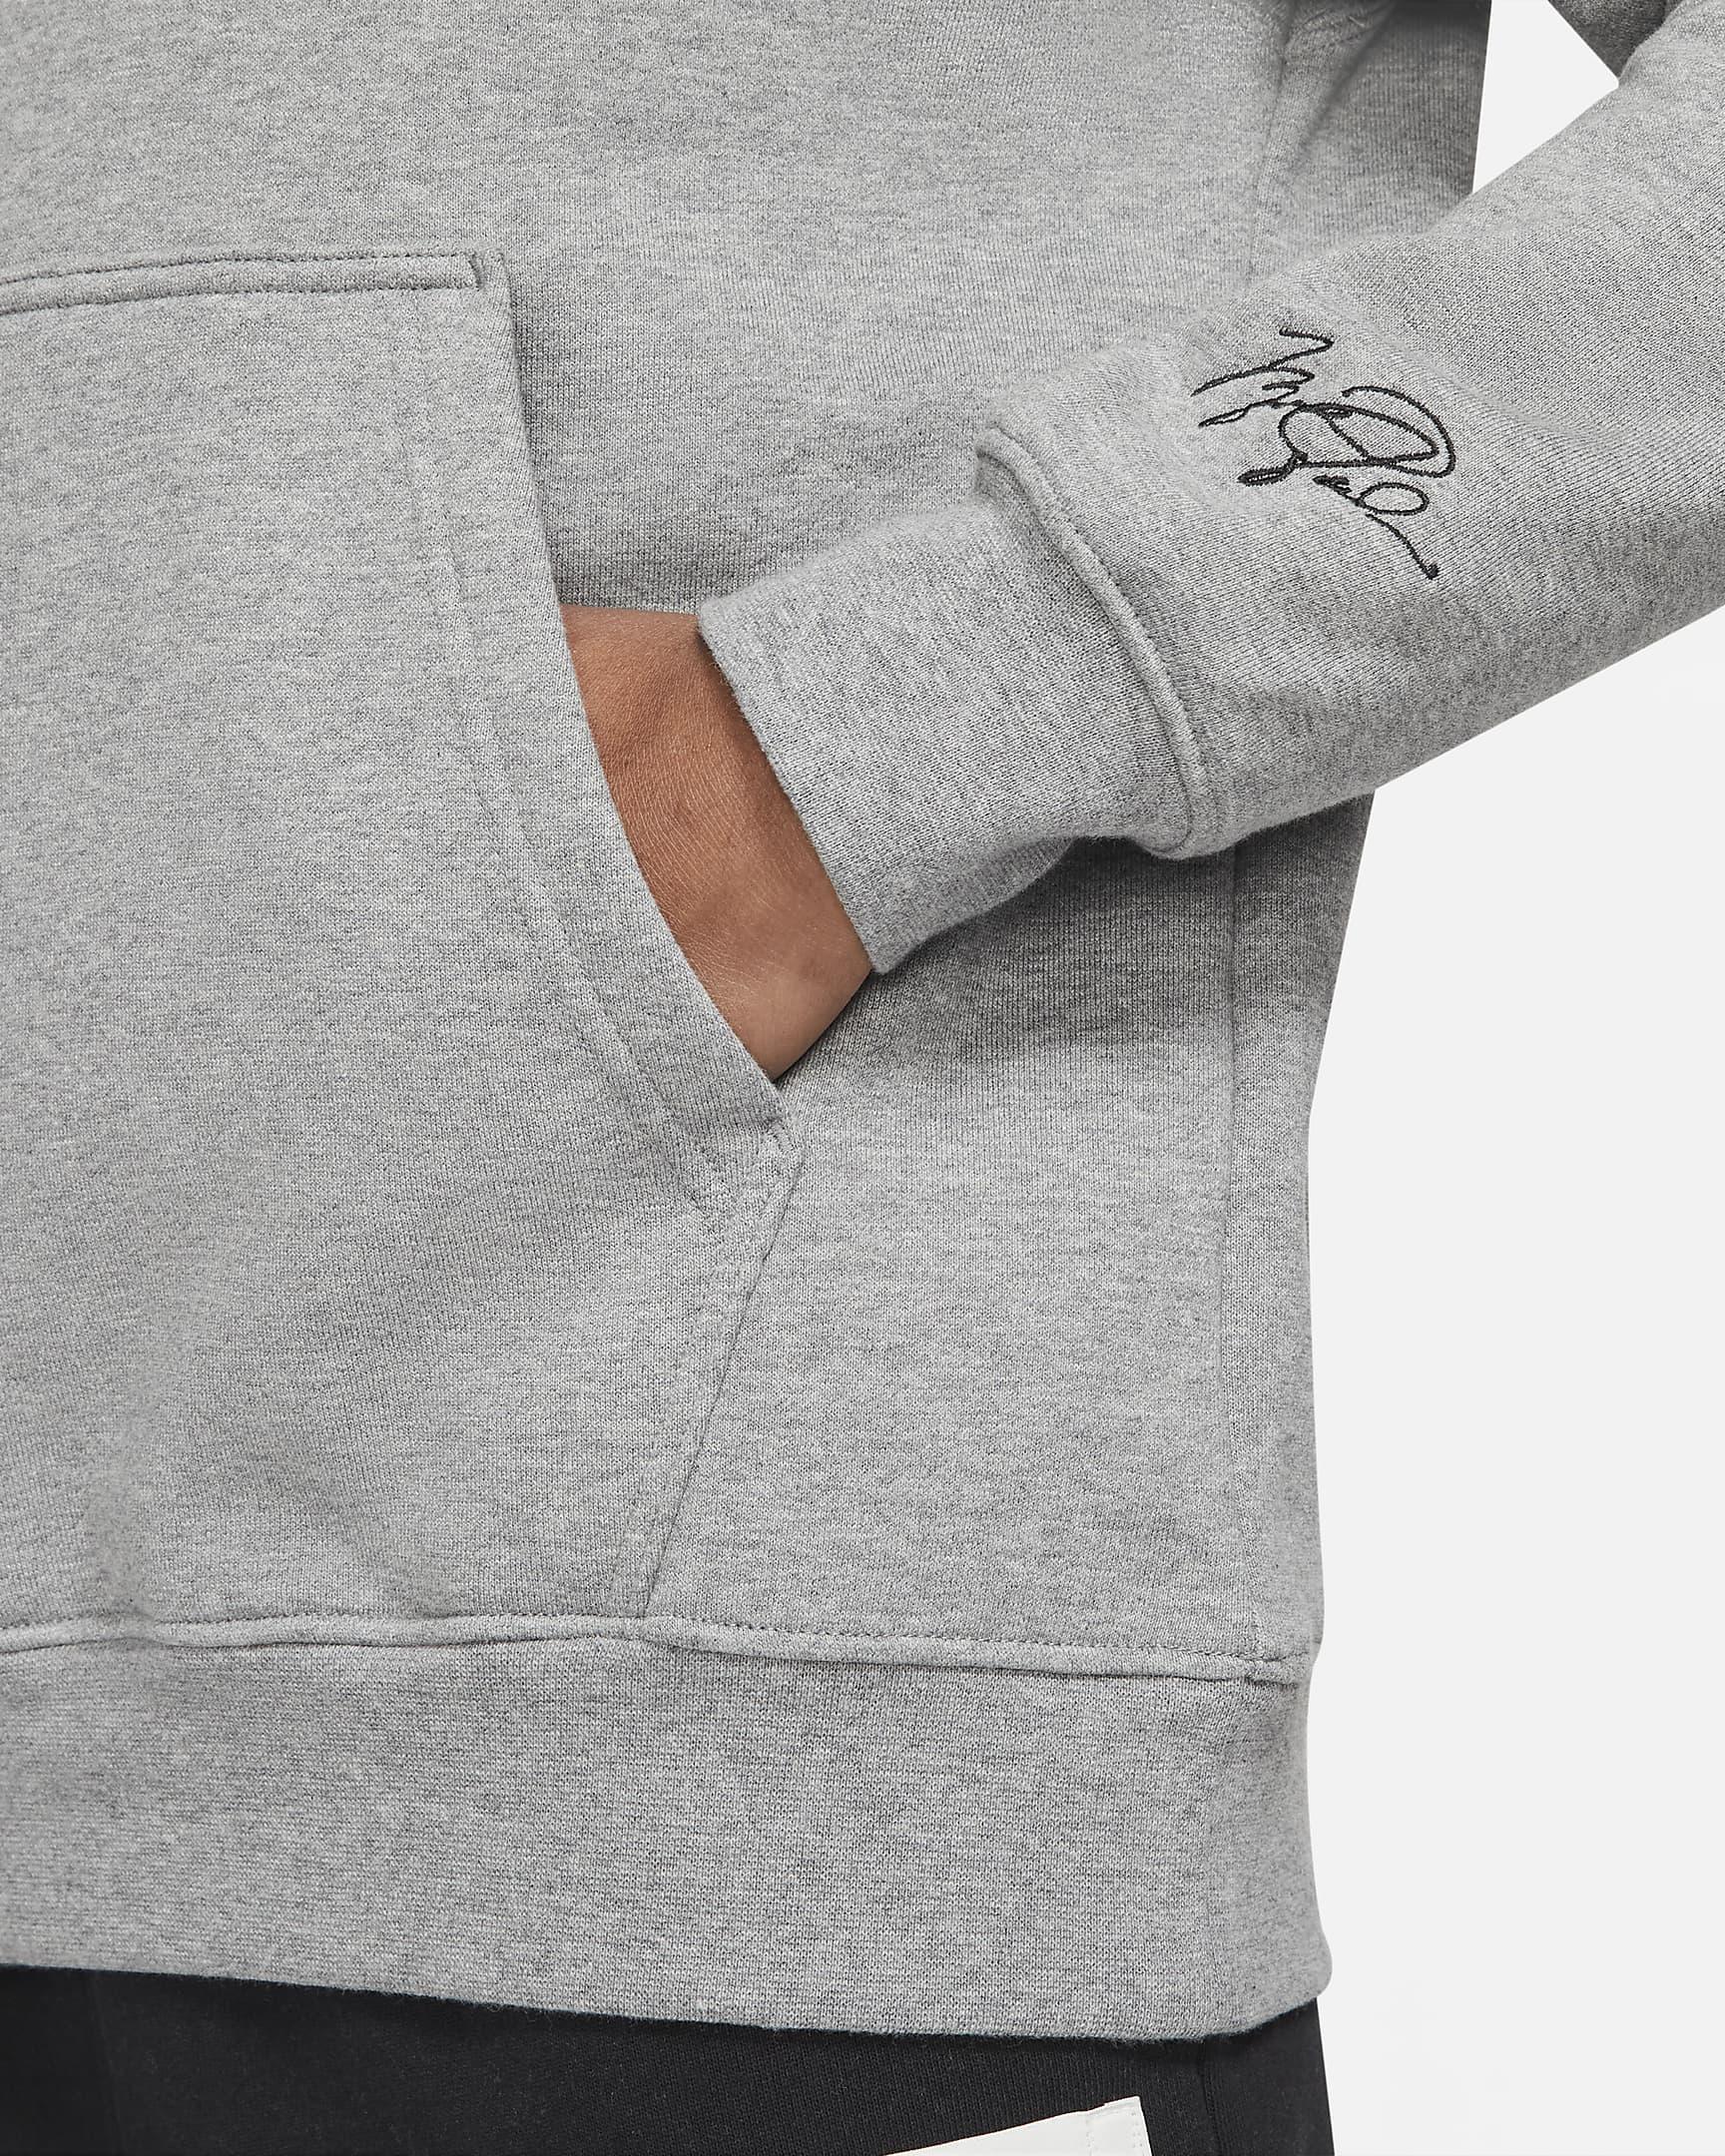 jordan-essentials-mens-fleece-pullover-hoodie-jG54lf-2.png